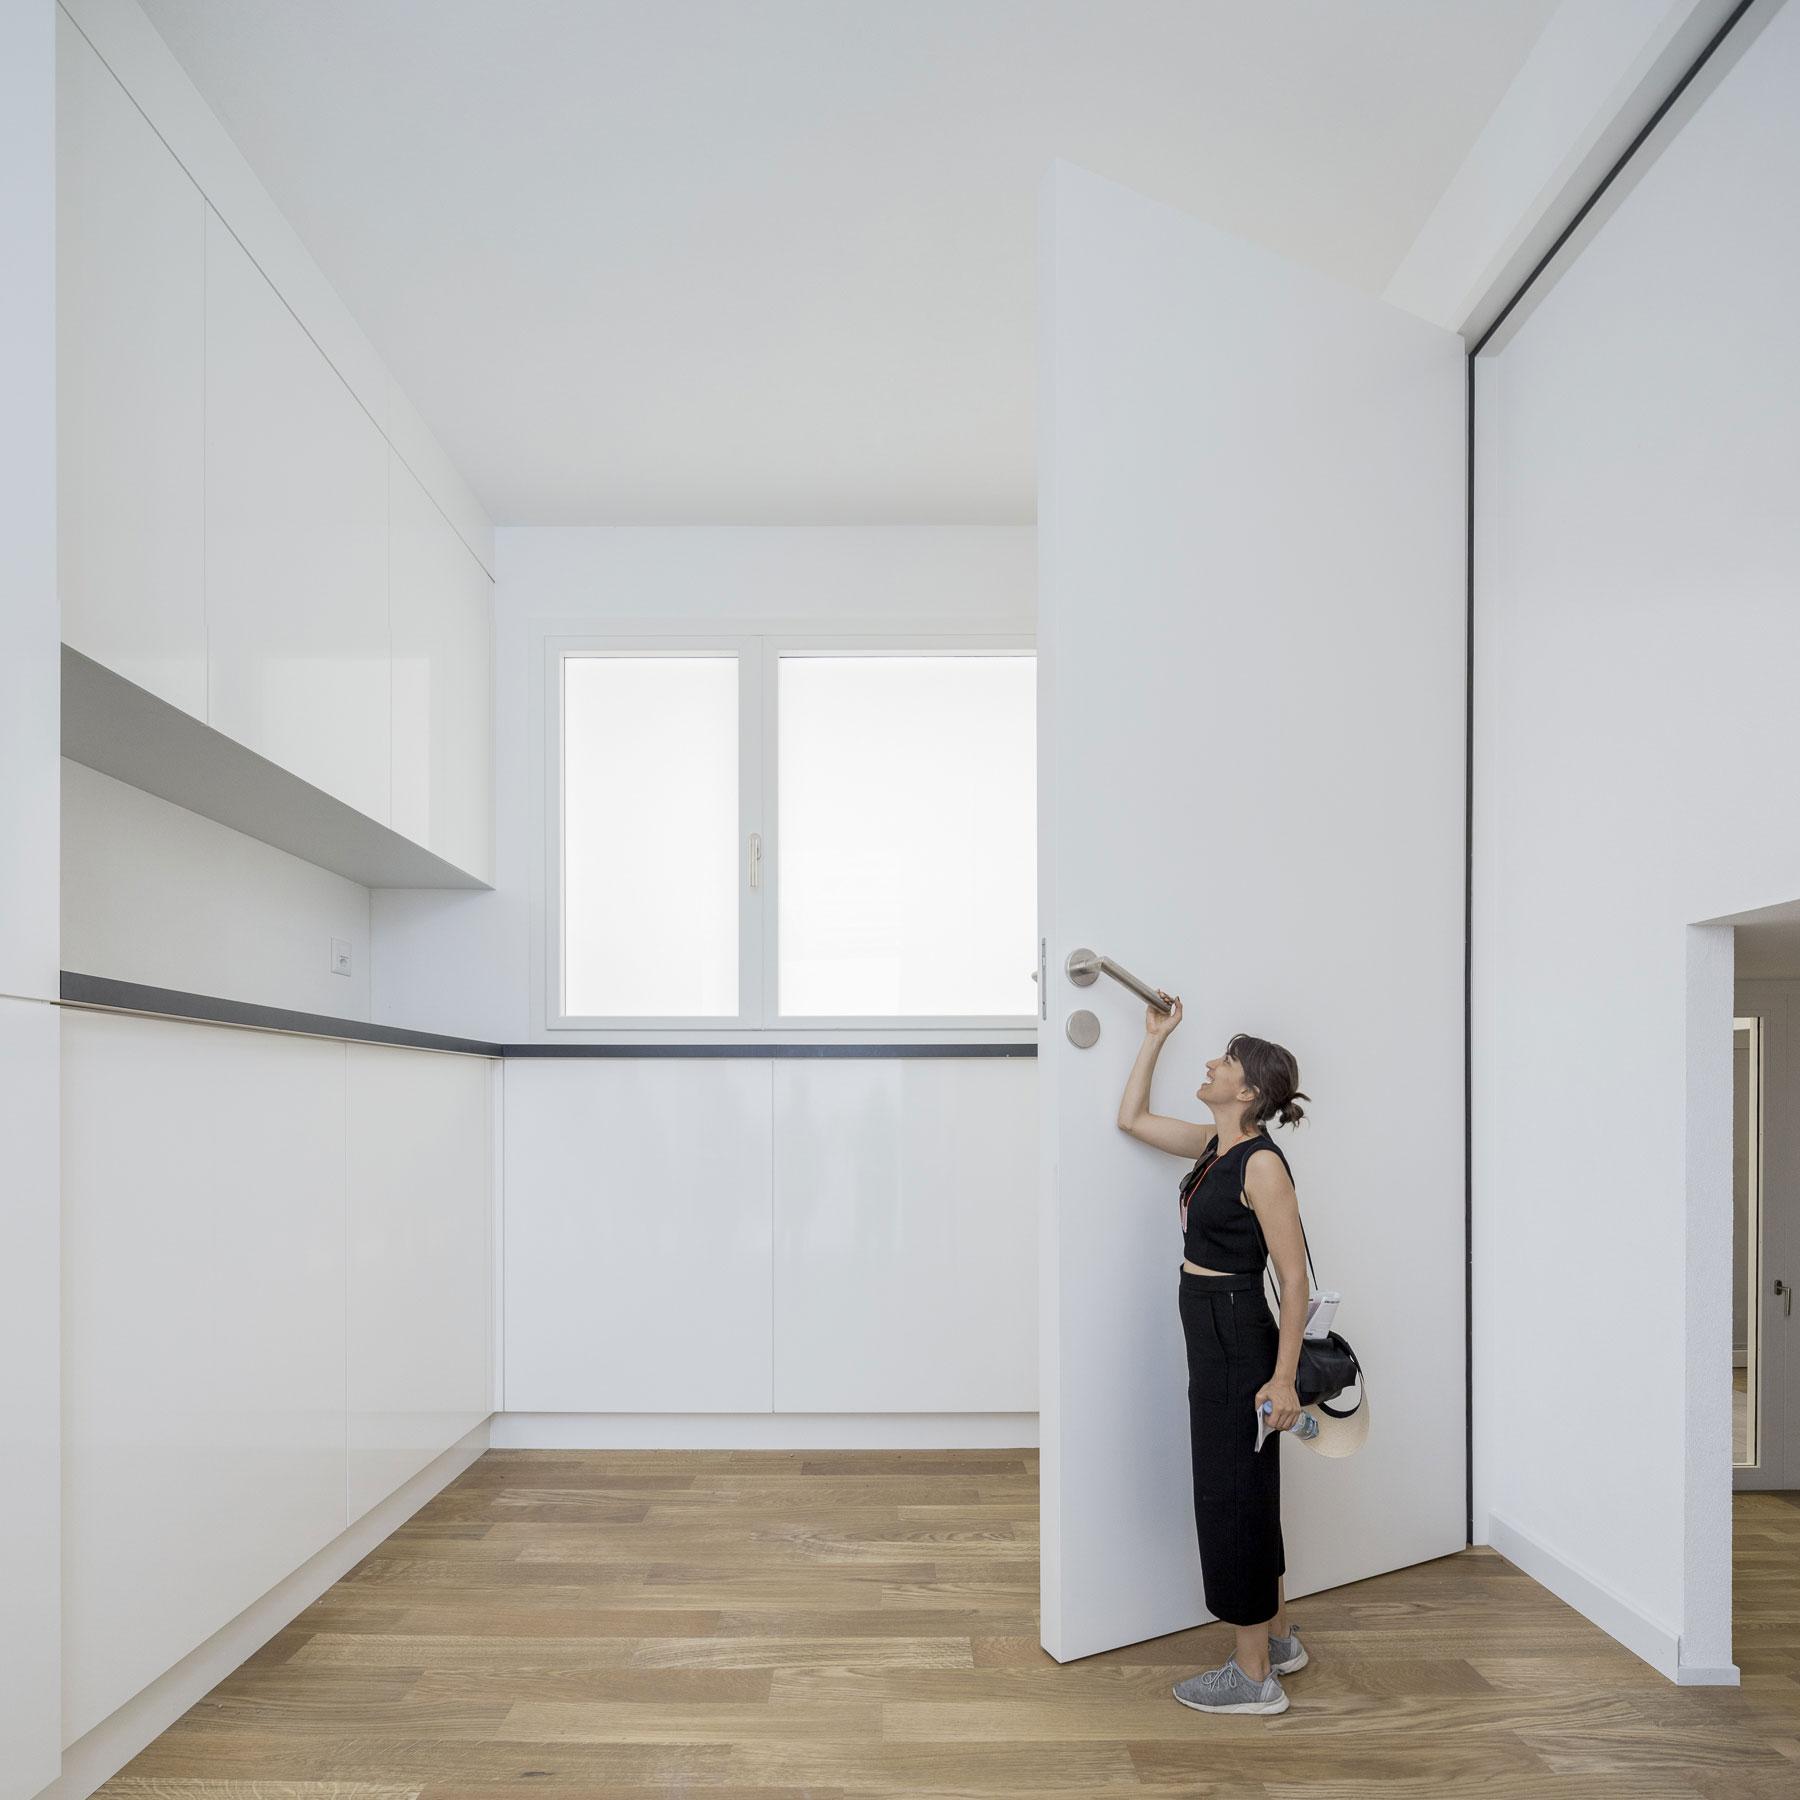 https://www.modernindenver.com/2018/07/venice-architectural-biennale-2018/